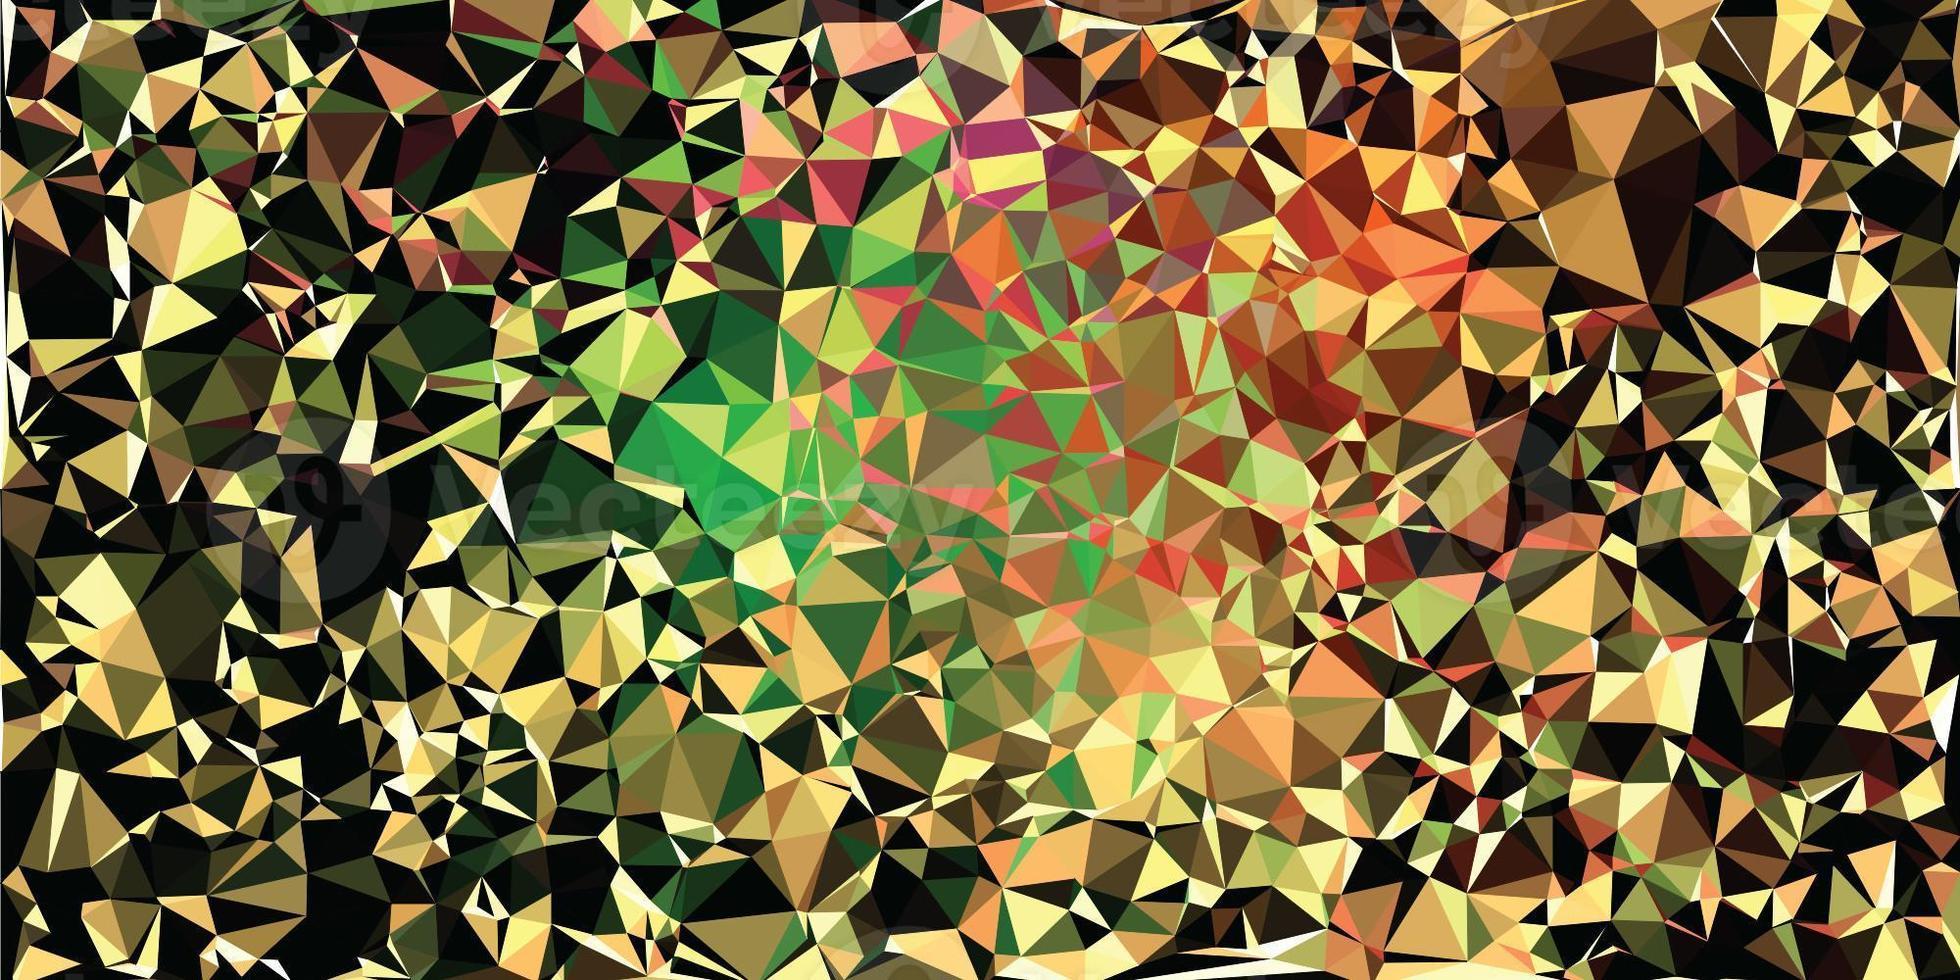 papel de parede de fundo geométrico foto